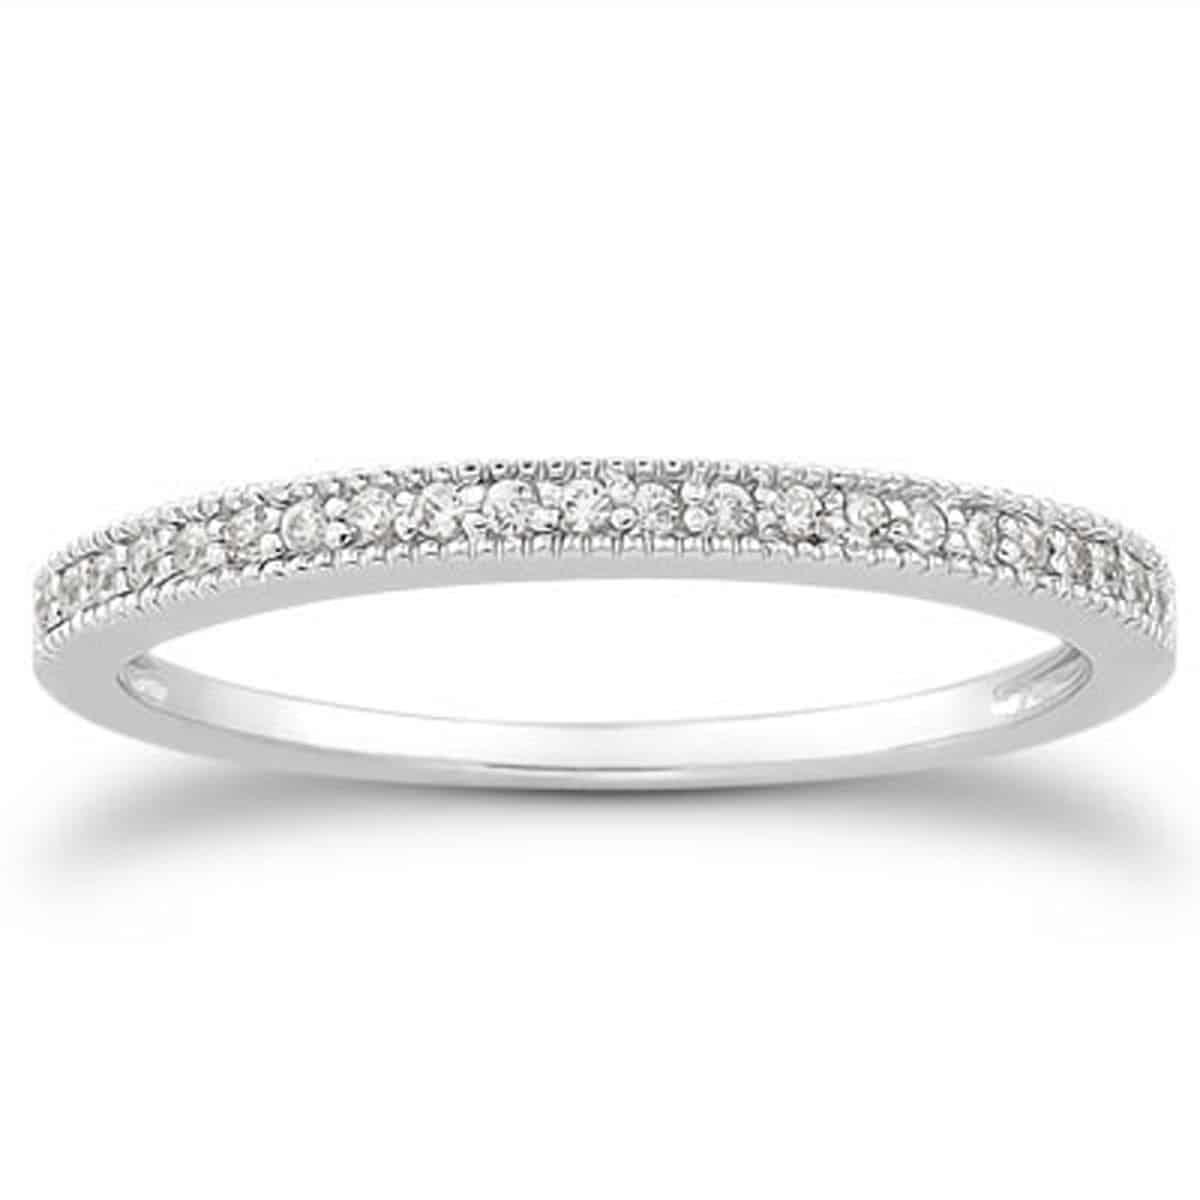 14k White Gold Diamond Micro Pave Diamond Milgrain Wedding Ring Band | Diamond Designs | Orange, Ct Jewelry Store Within Recent Diamond And Milgrain Anniversary Bands In White Gold (View 11 of 25)